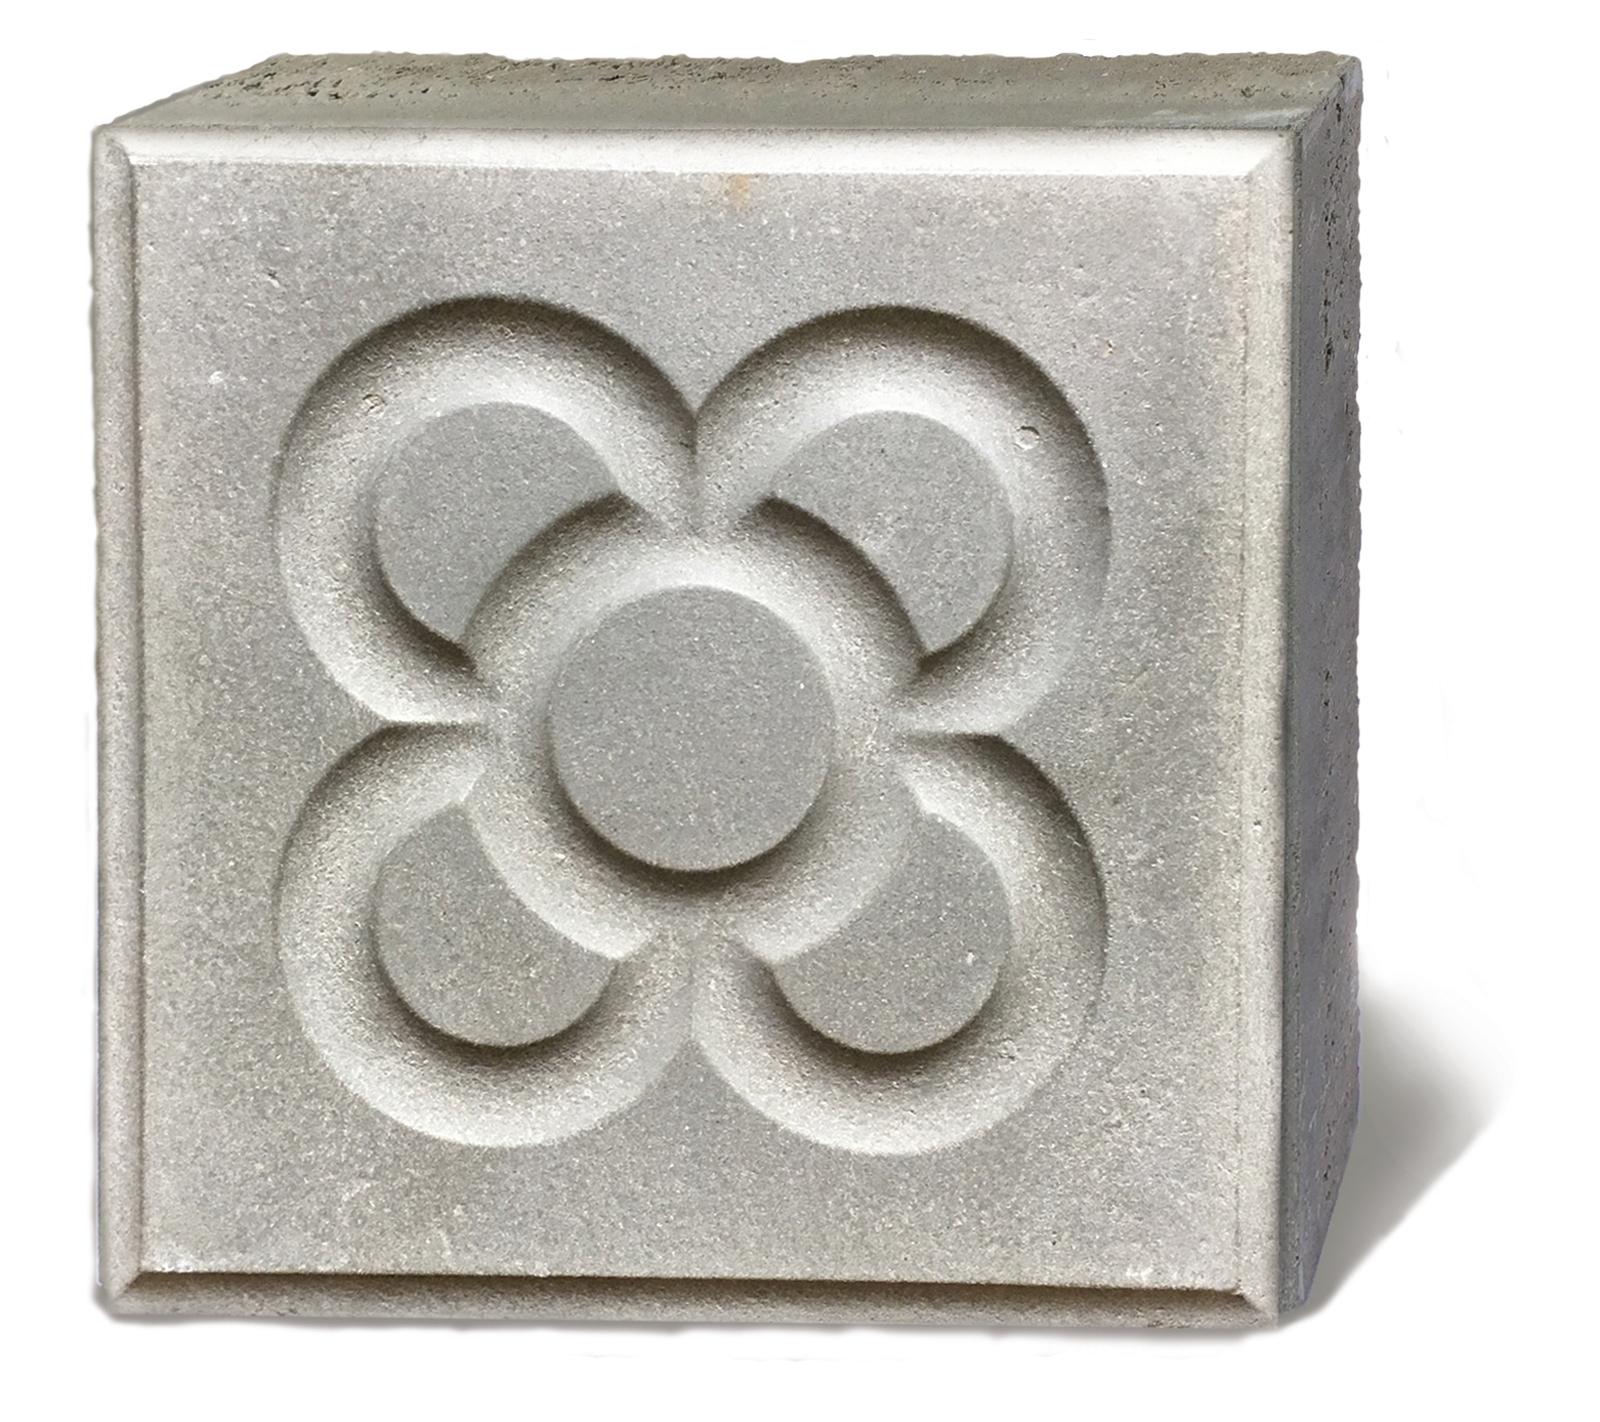 trottoirplatten-AP13-3D-viaplatten